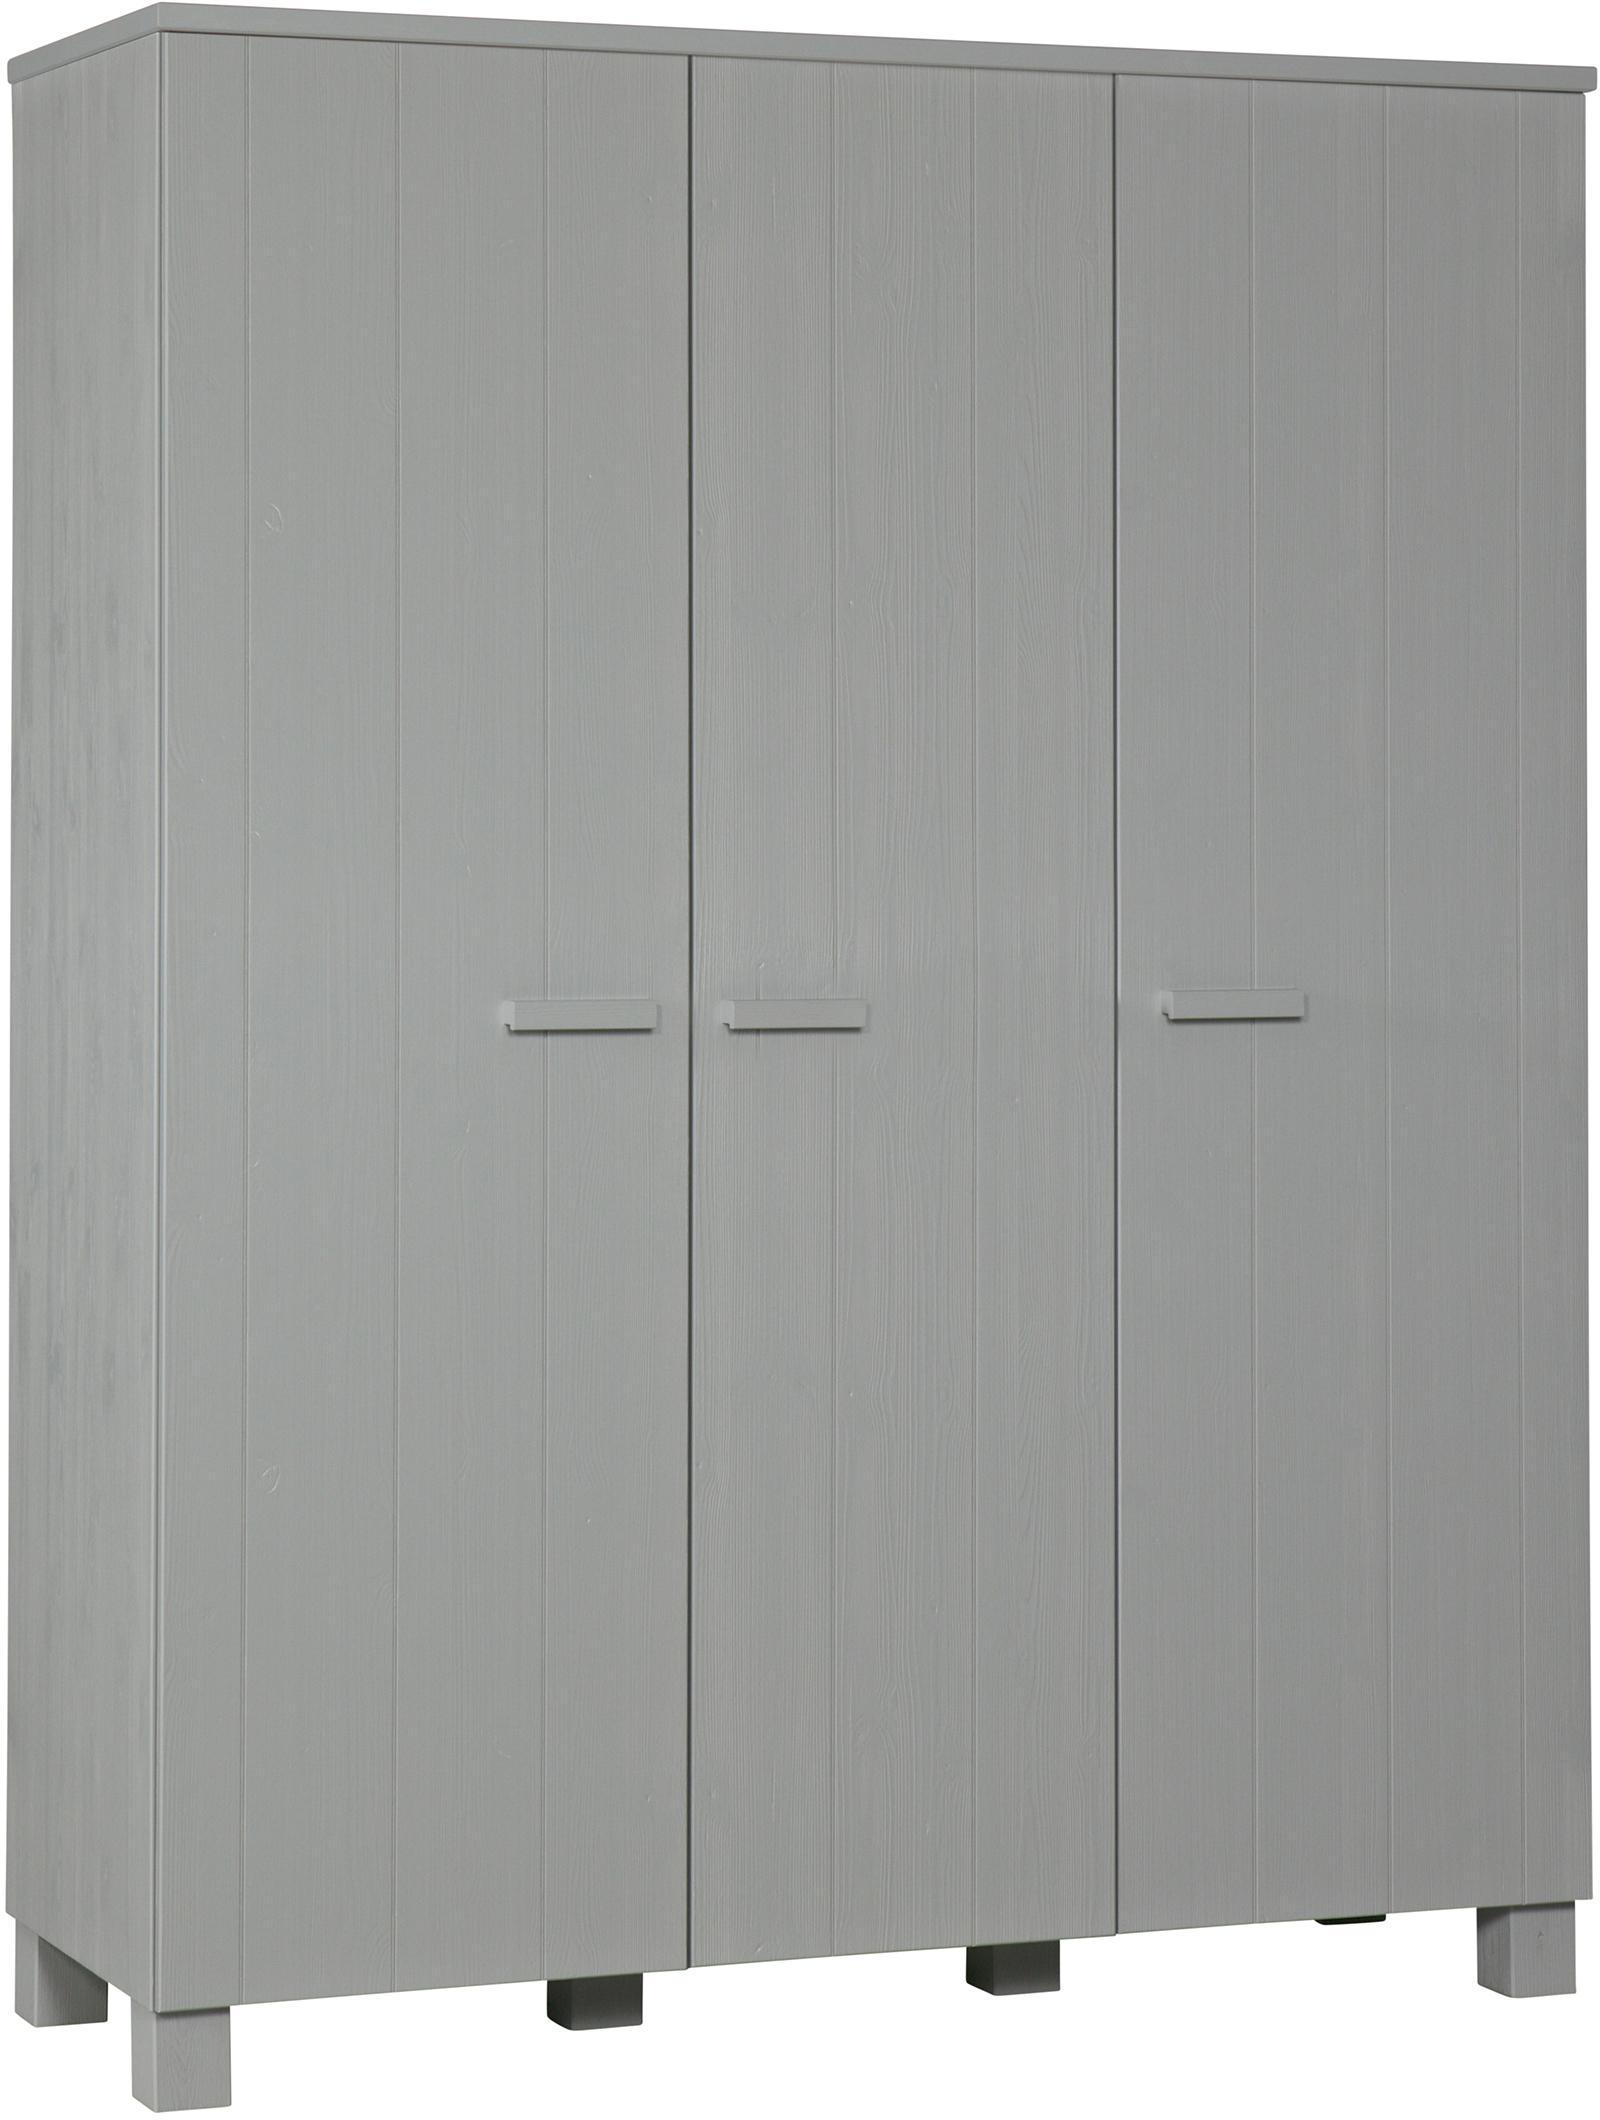 Kleiderschrank Dennis aus Kiefernholz, Kiefernholz, gebürstet und lackiert, Betongrau, 158 x 202 cm